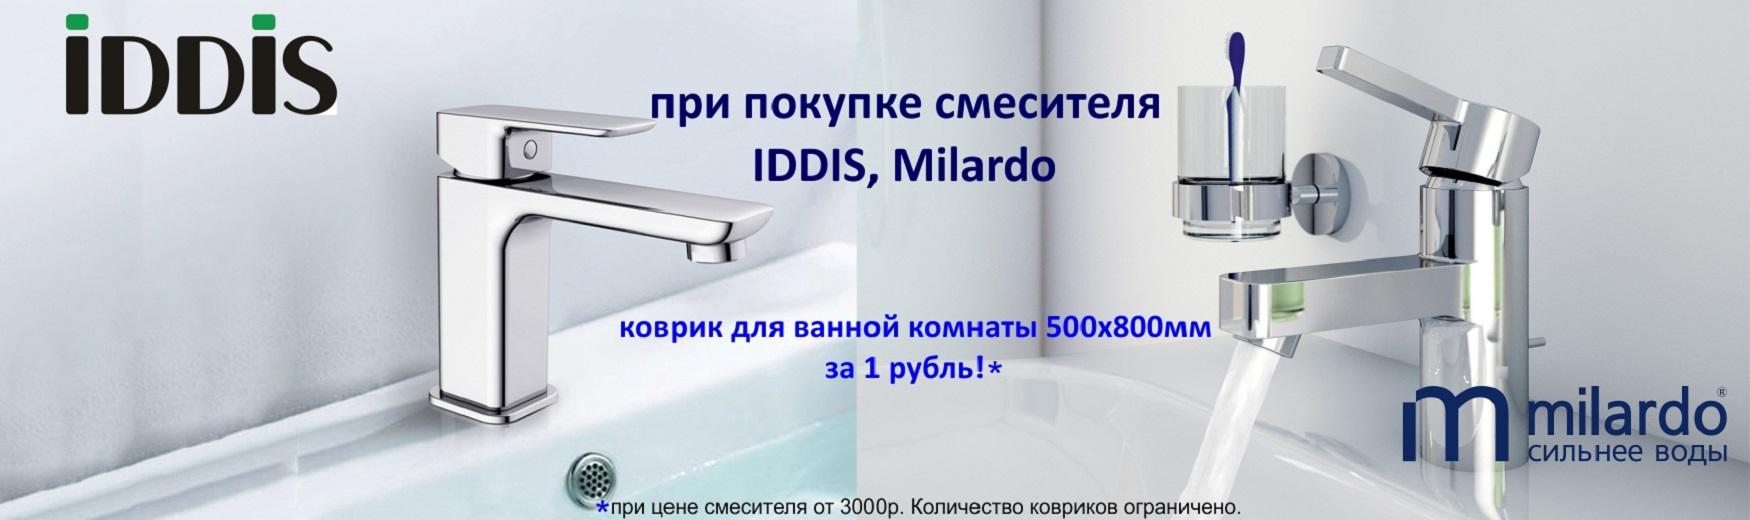 IDDISMilardo20214